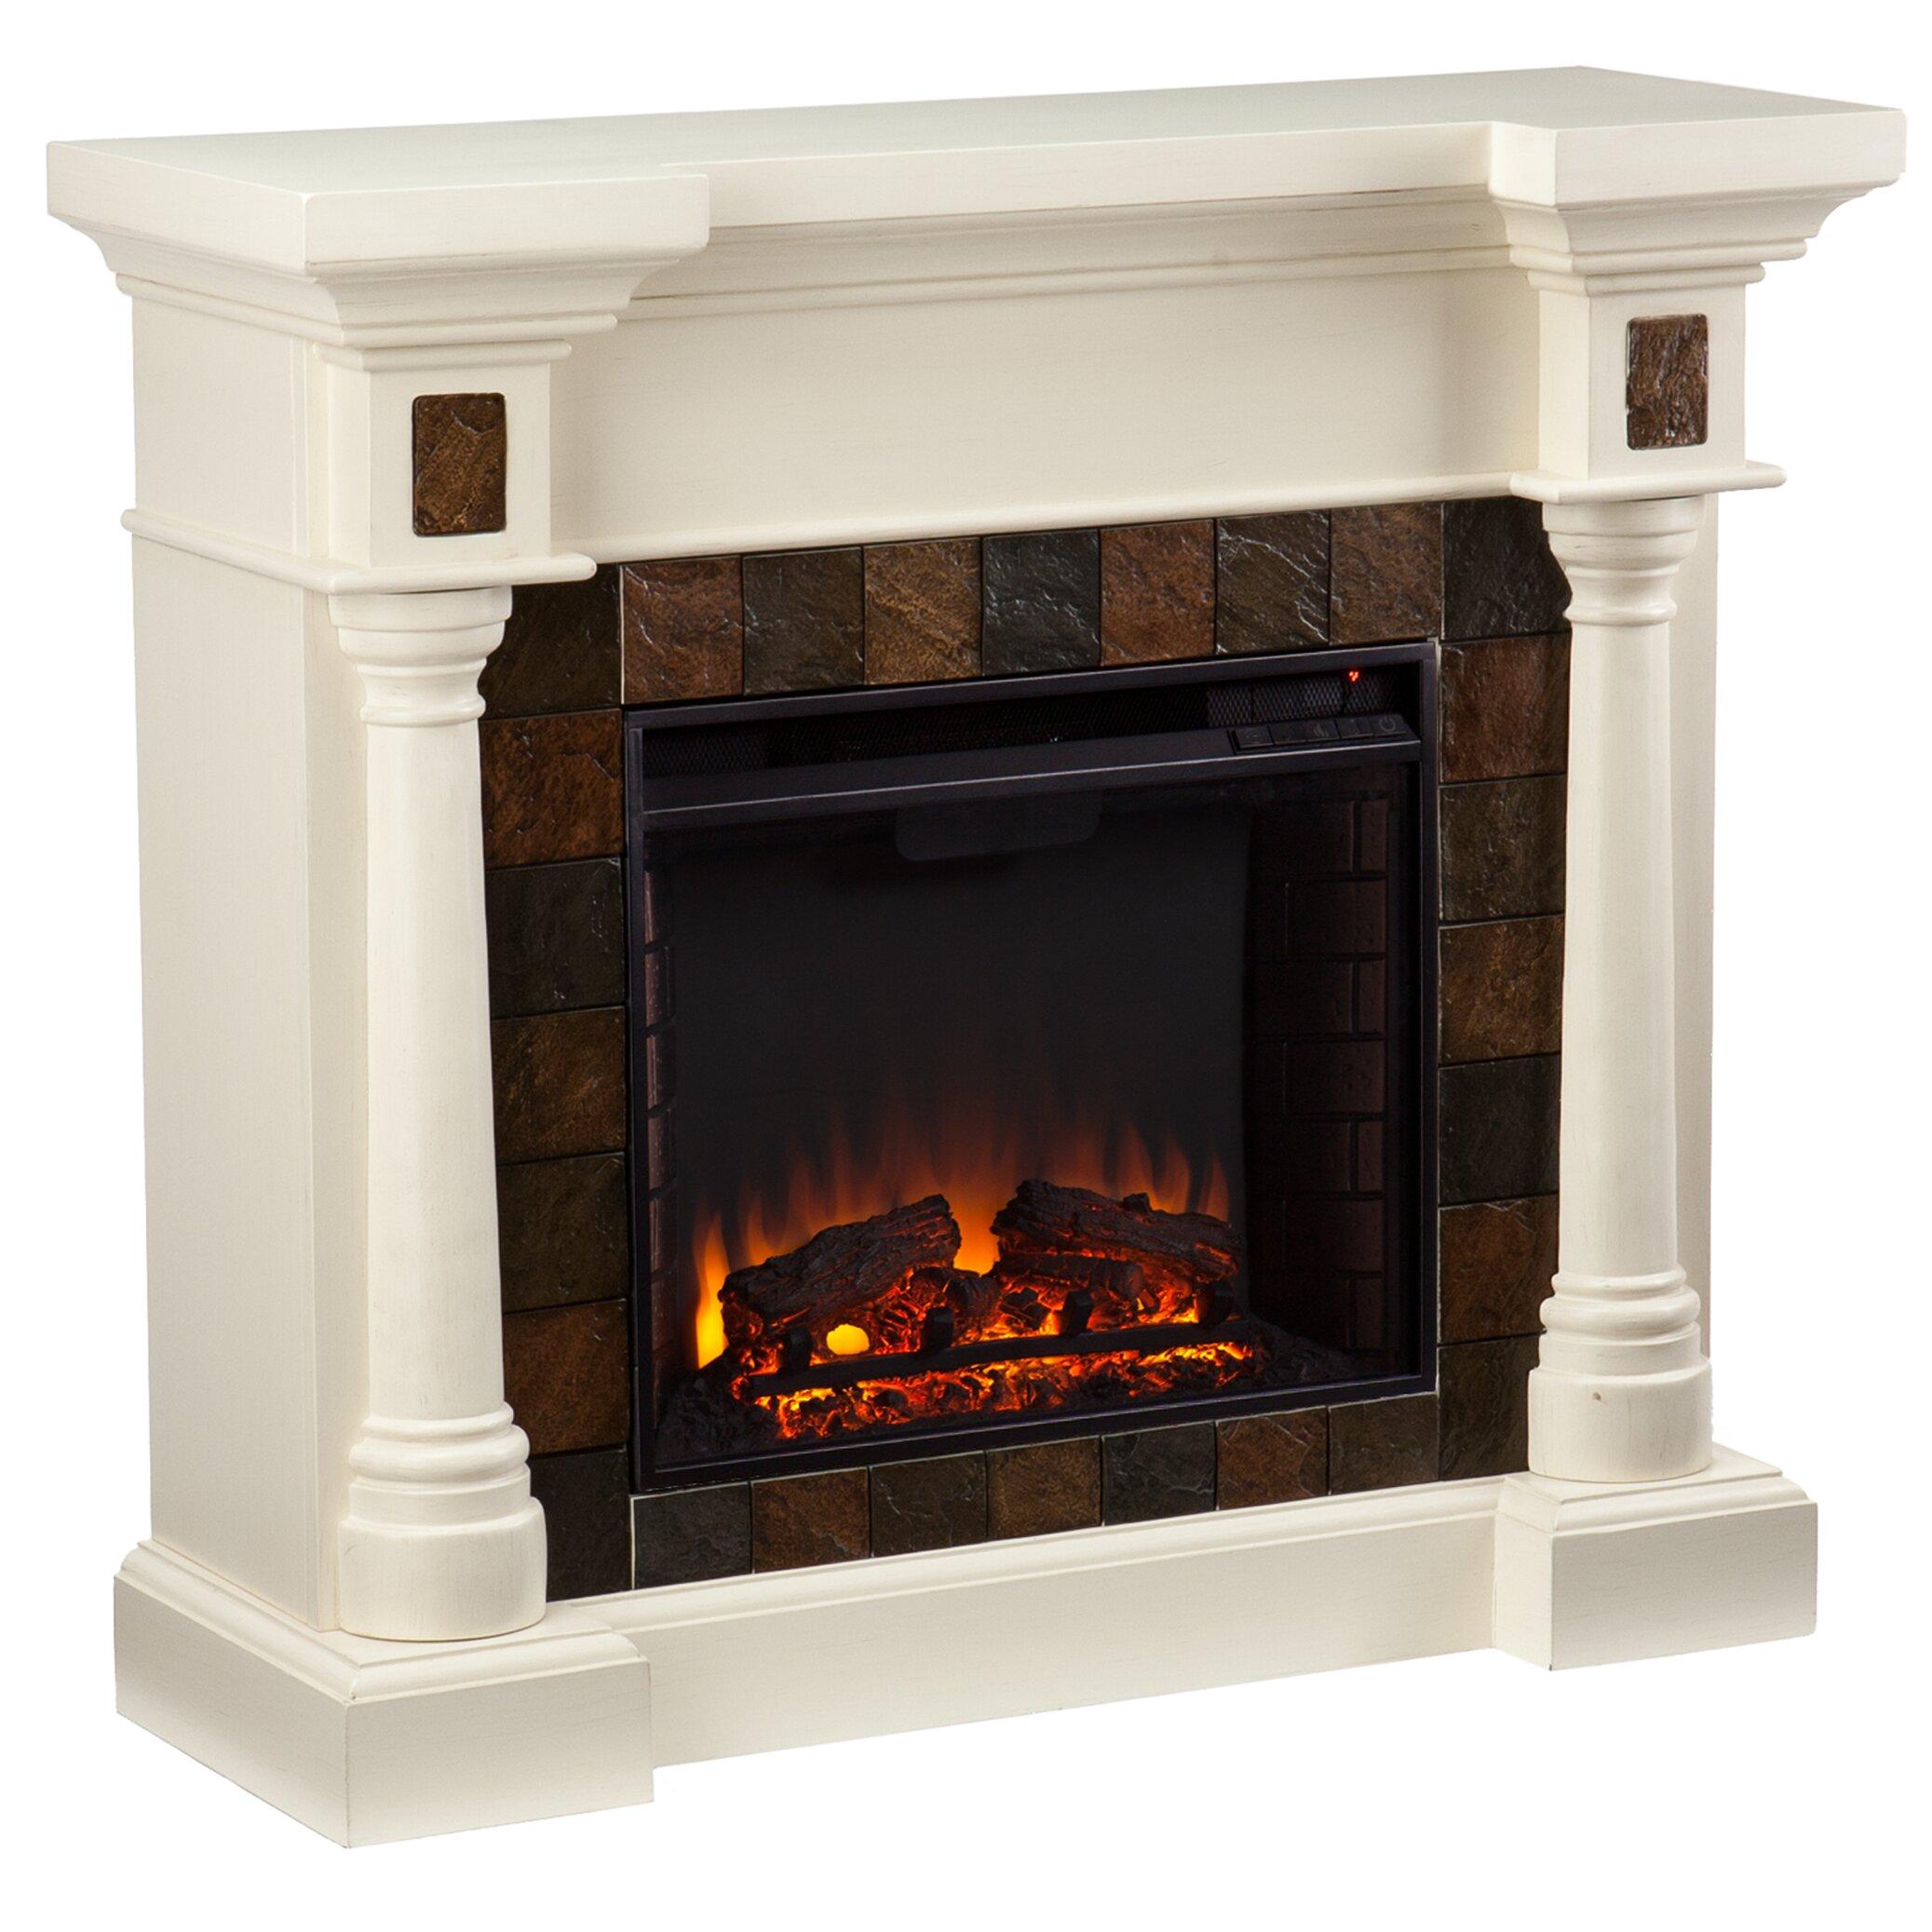 Wayfair Com Sales: Woodhaven Hill Clark Electric Fireplace & Reviews